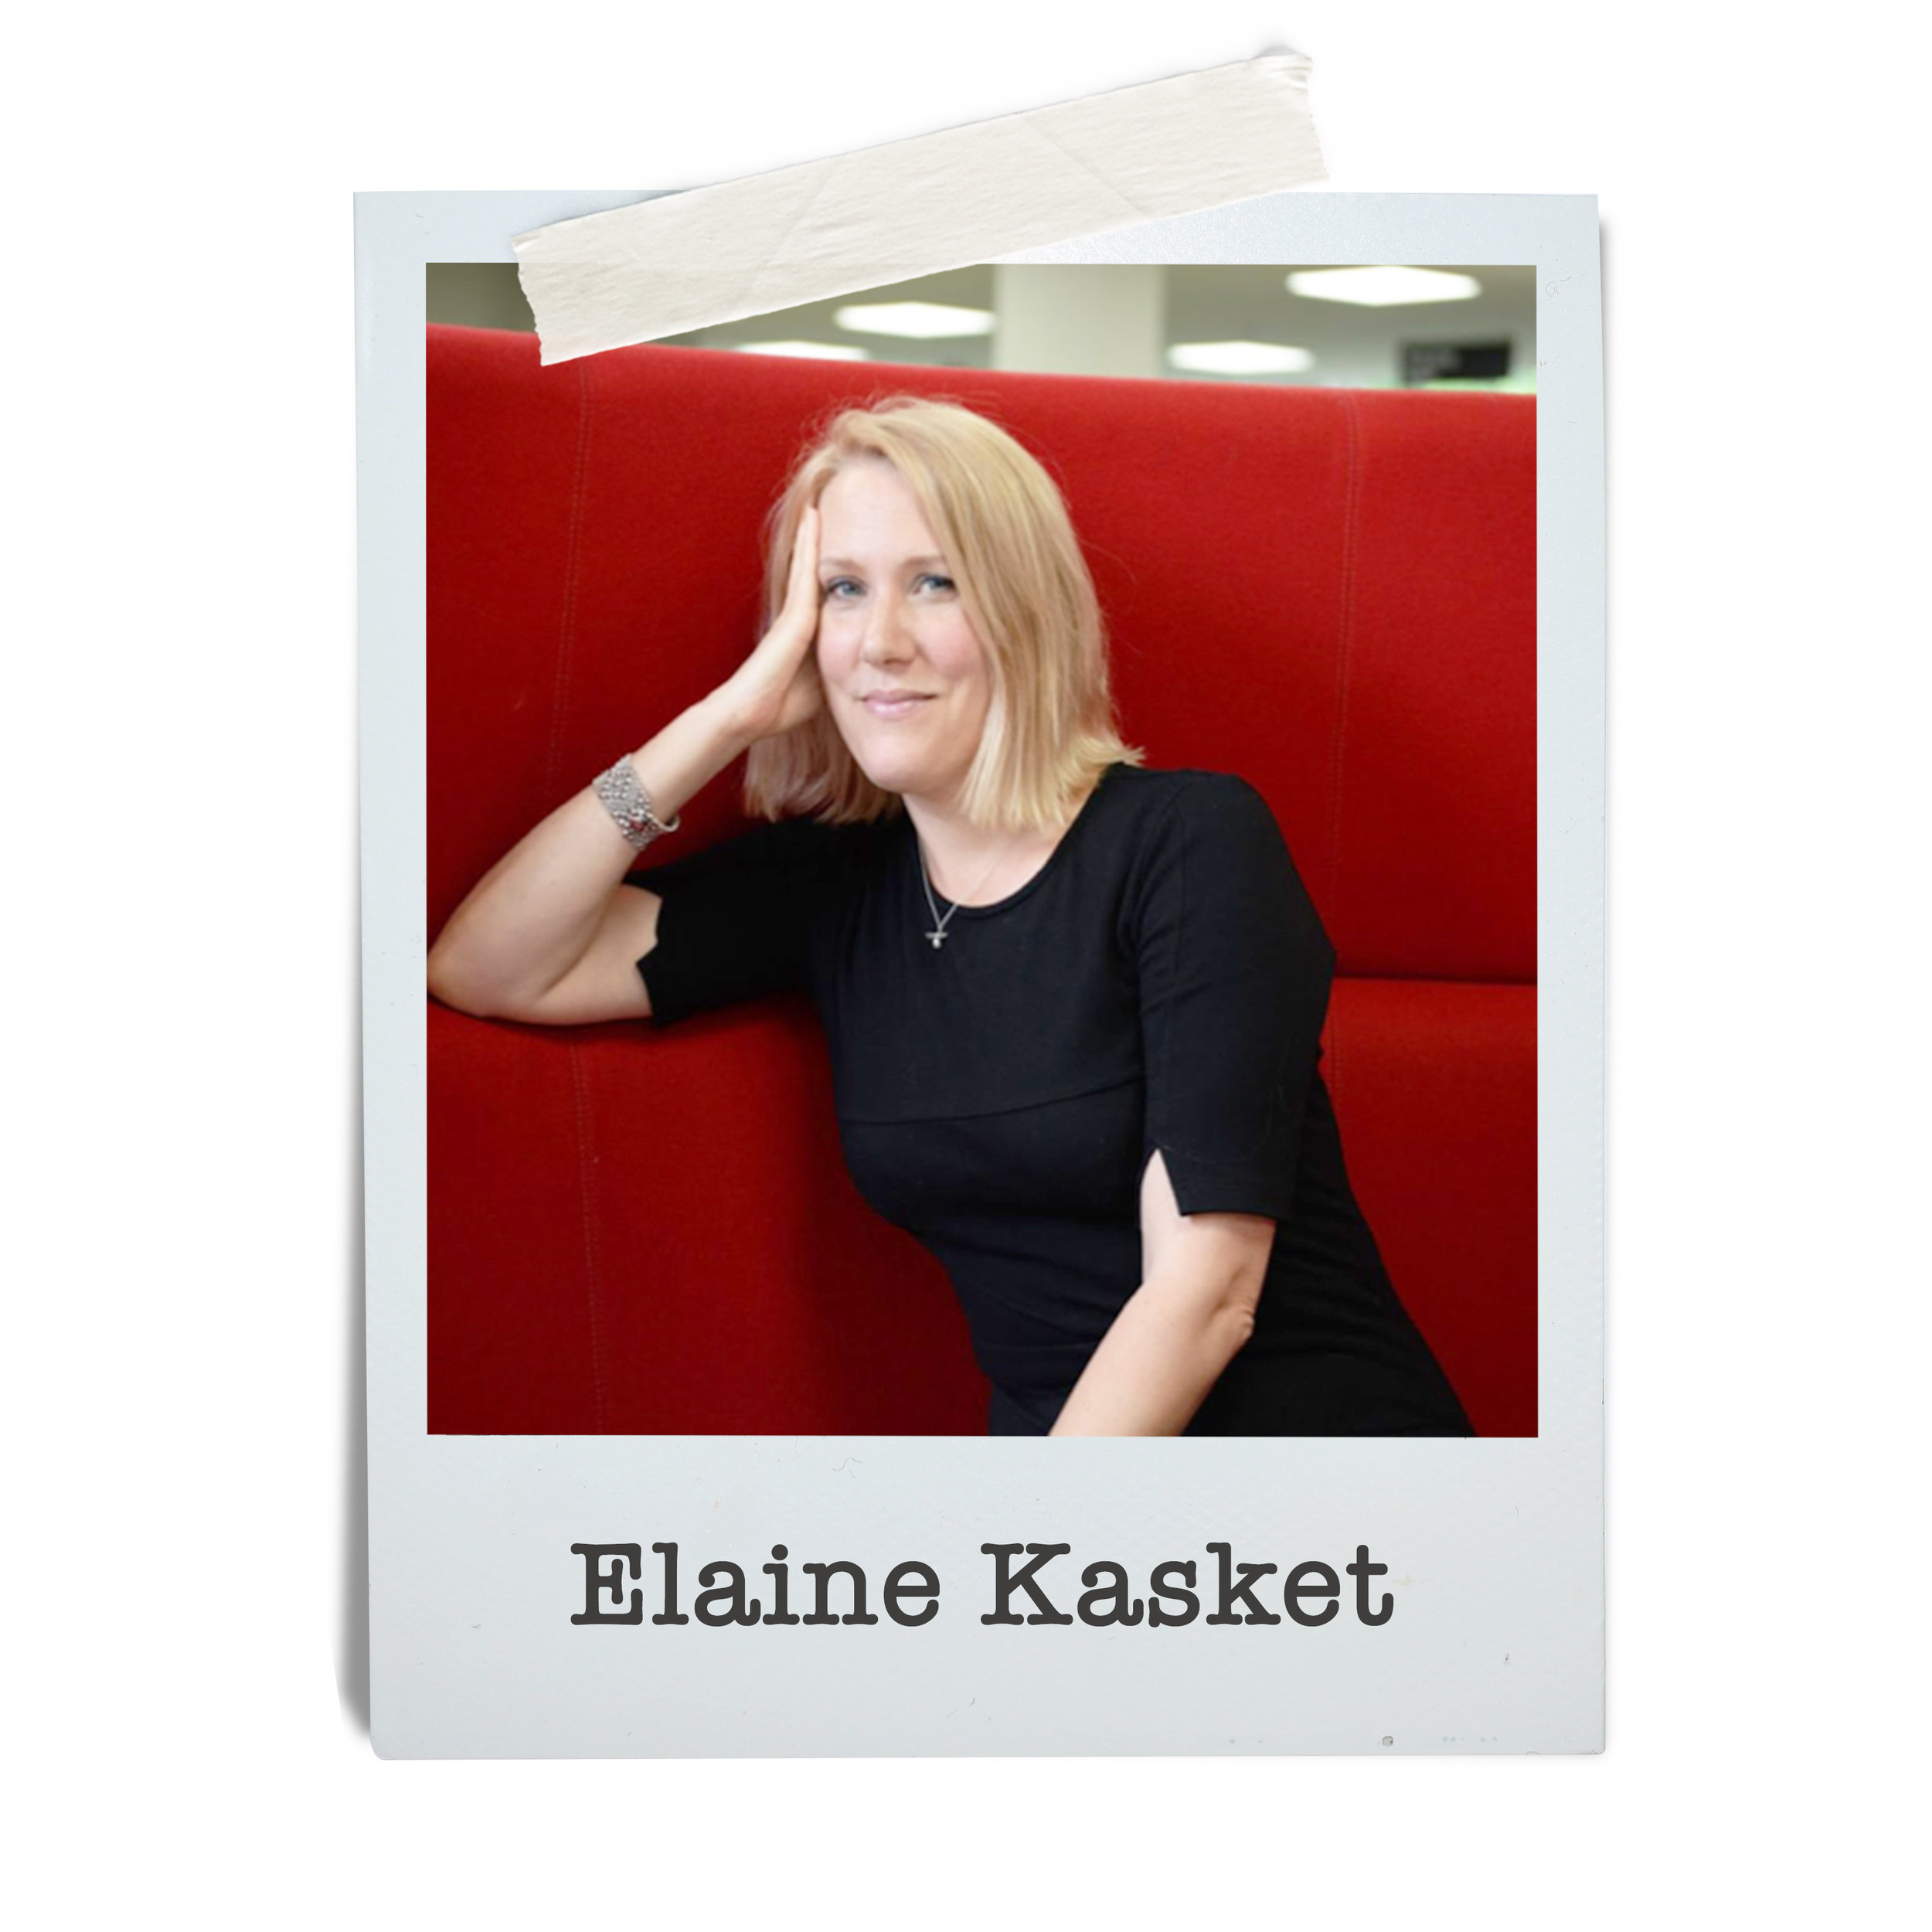 Elaine Kasket